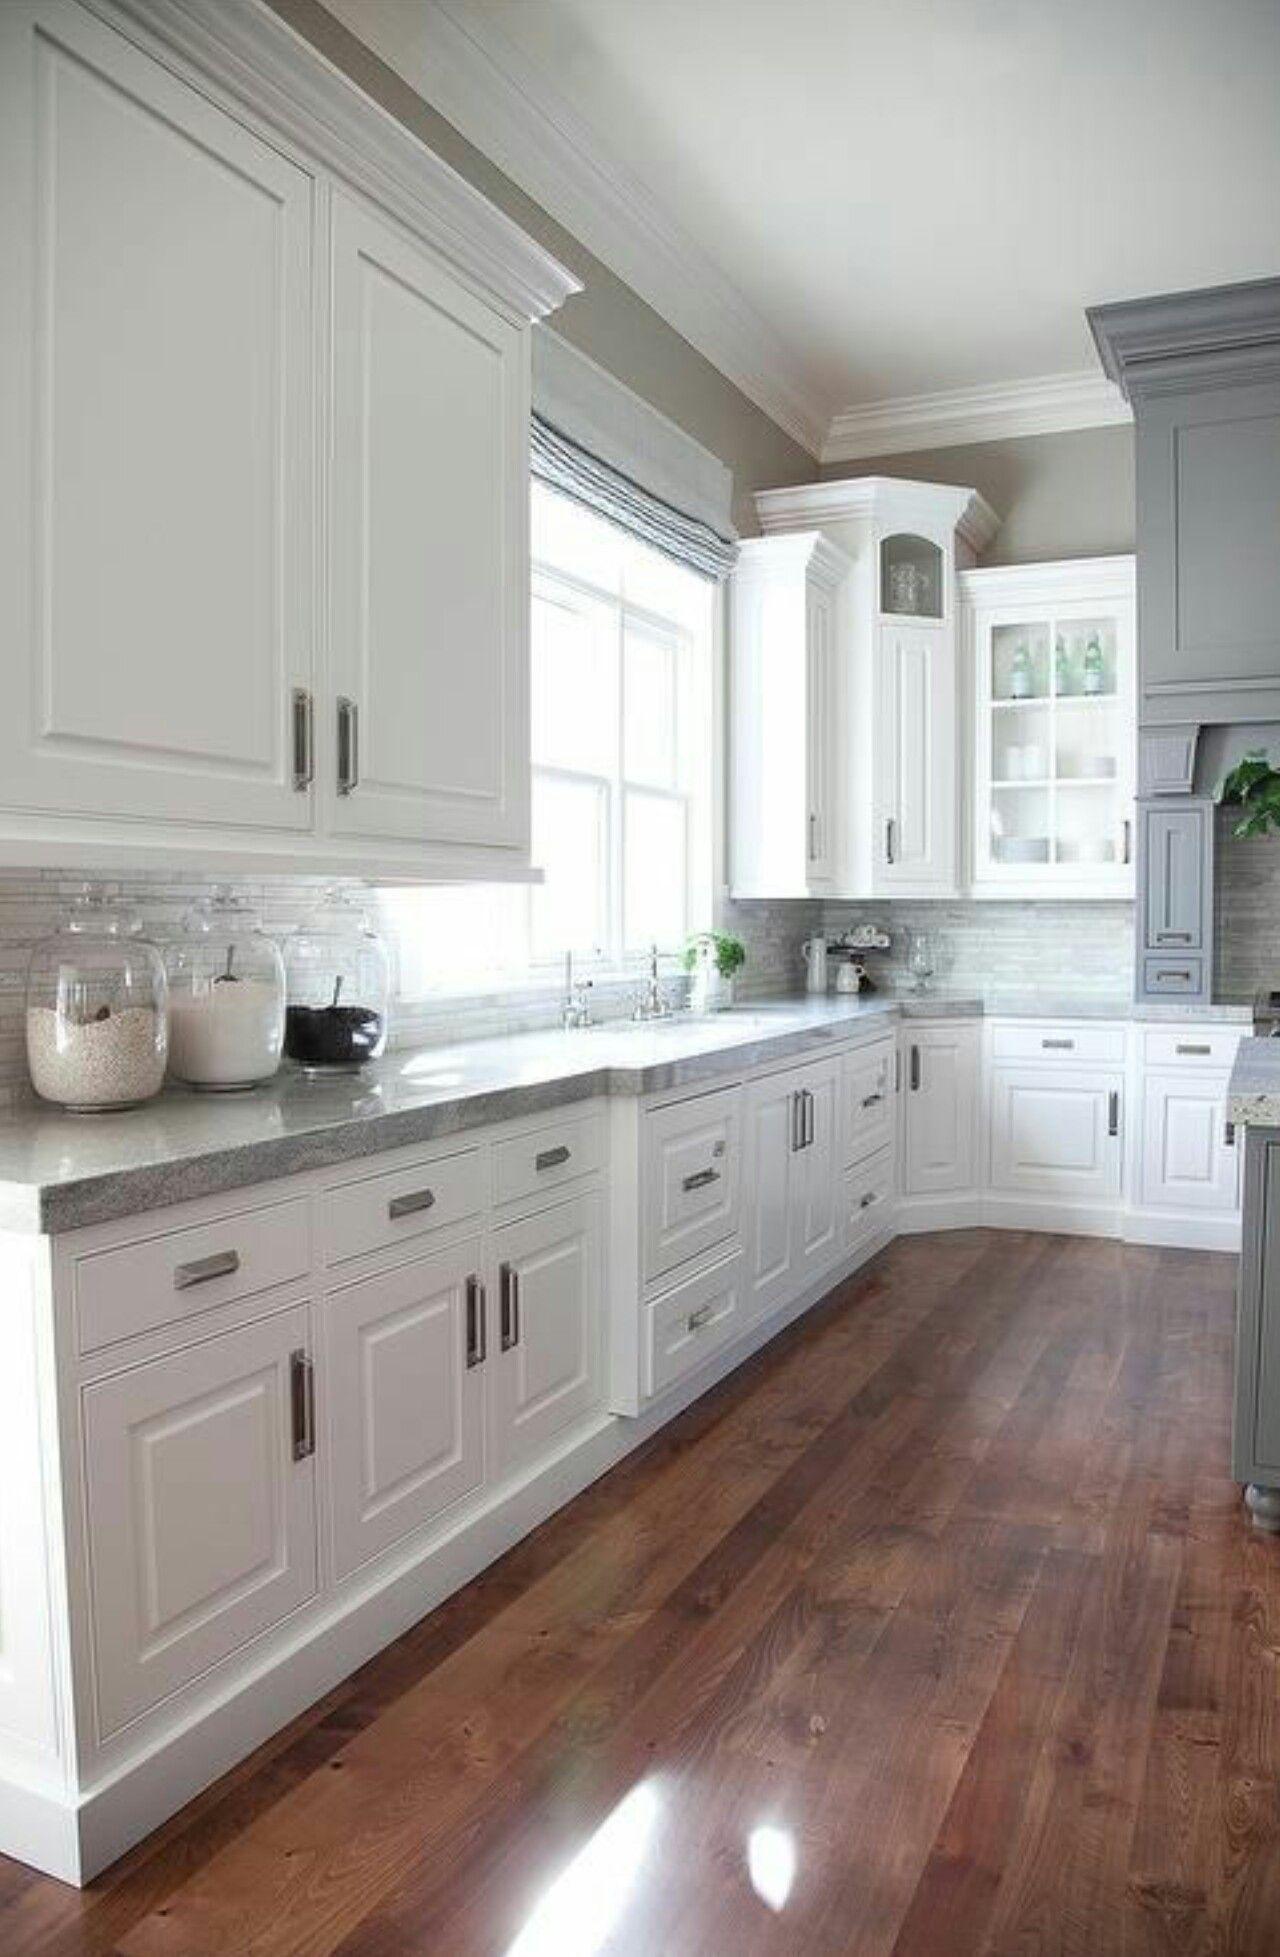 White cabinets grey counter tops light grey back splash soft grey